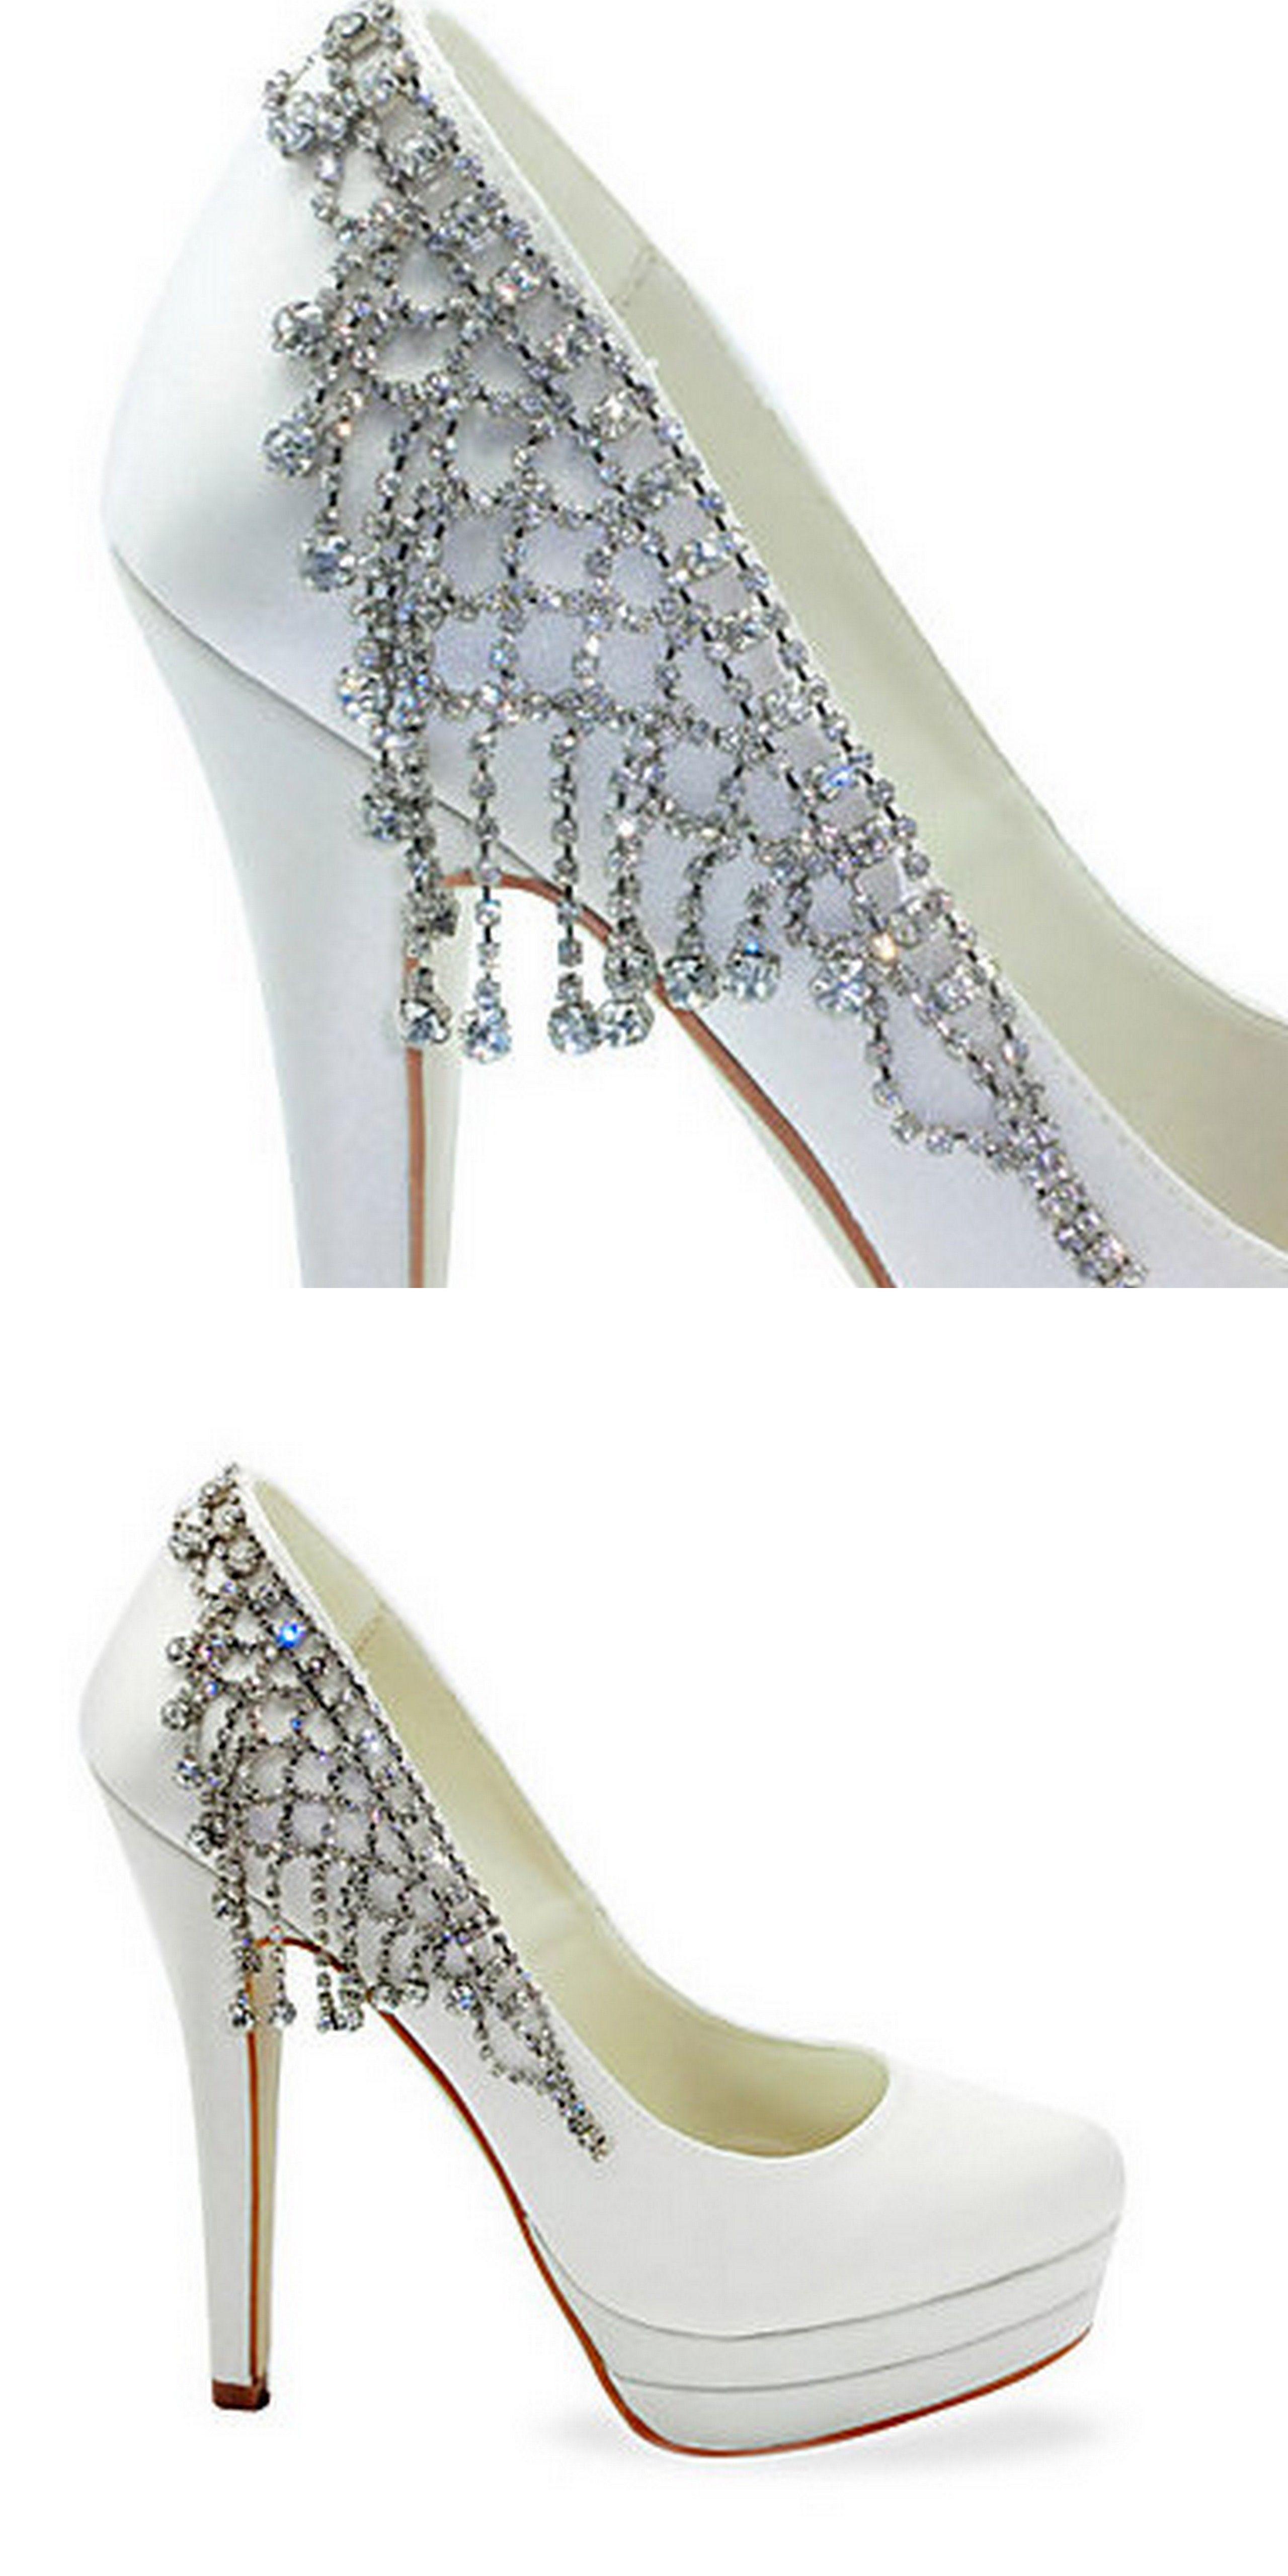 [$49.99] Spring / Summer / Fall / Winter Heels Wedding Stiletto Heel  RhinestoneBlack / Blue / Pink / Purple / Red / Ivory / White / Silver / Gold